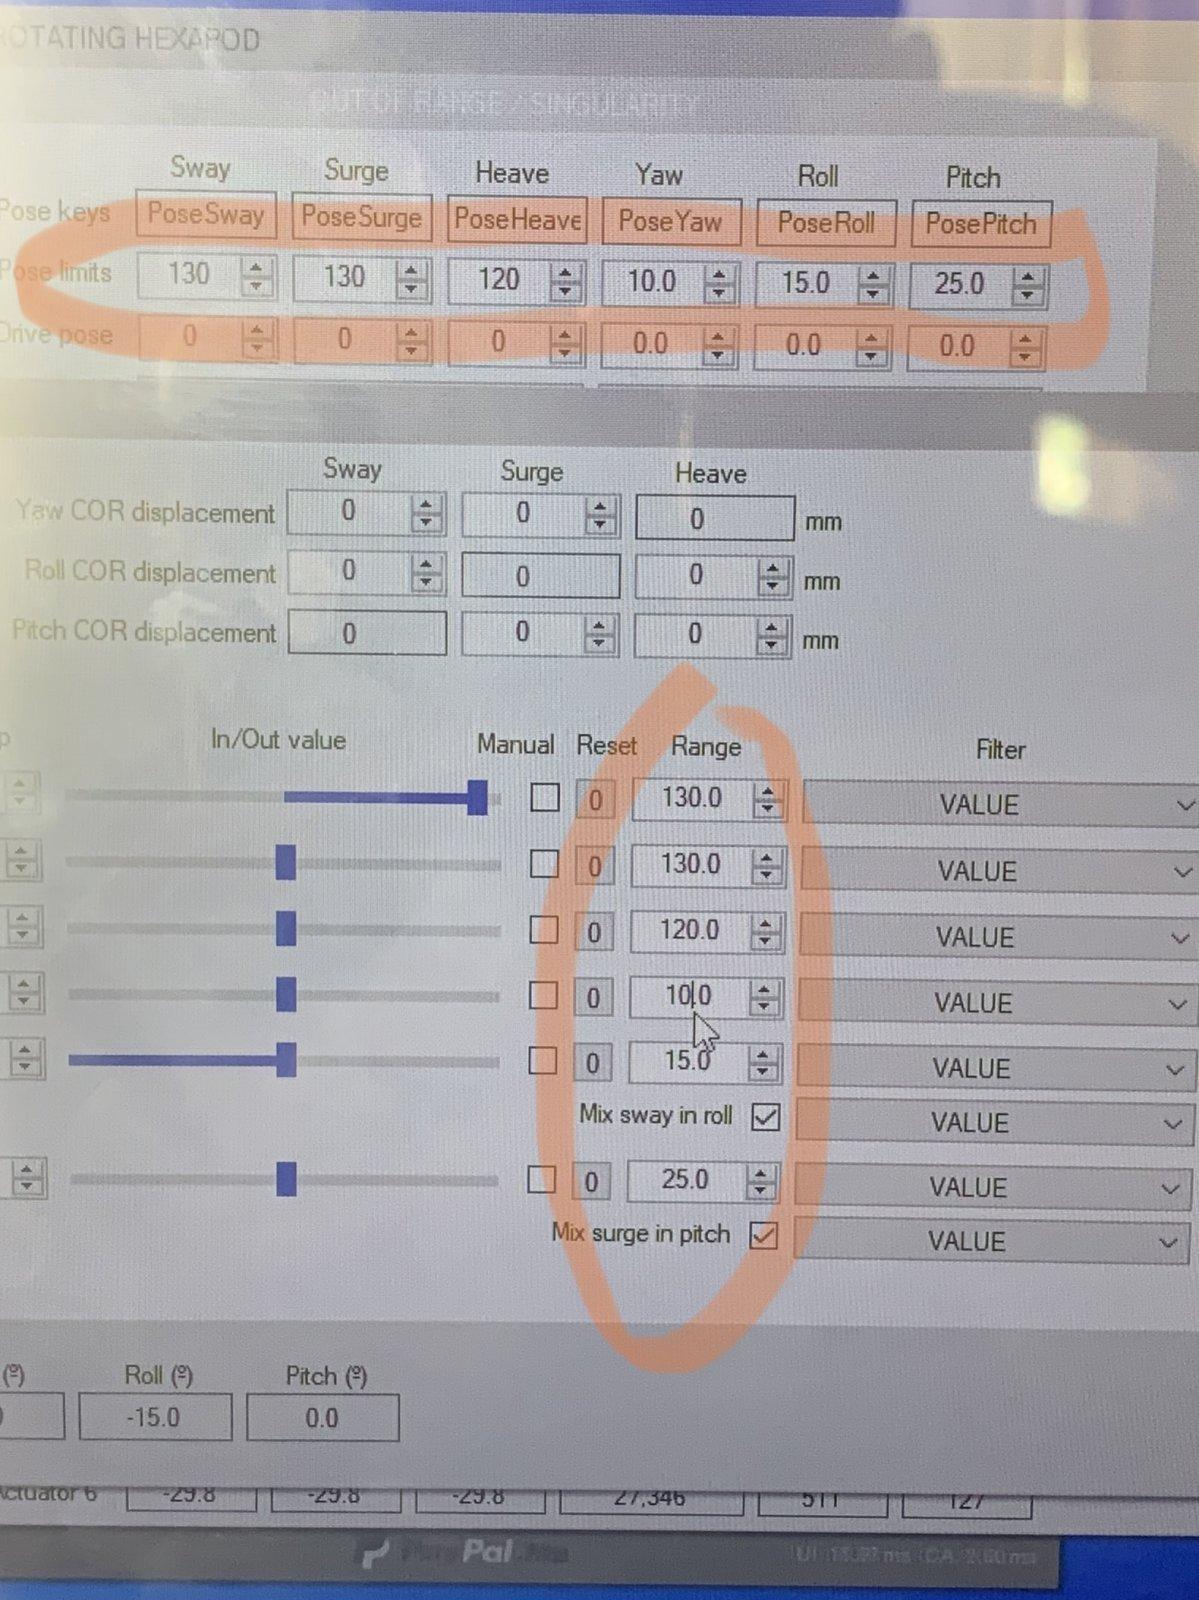 274BB6B6-3B47-43EB-8AC3-5E2C6529D306.jpeg